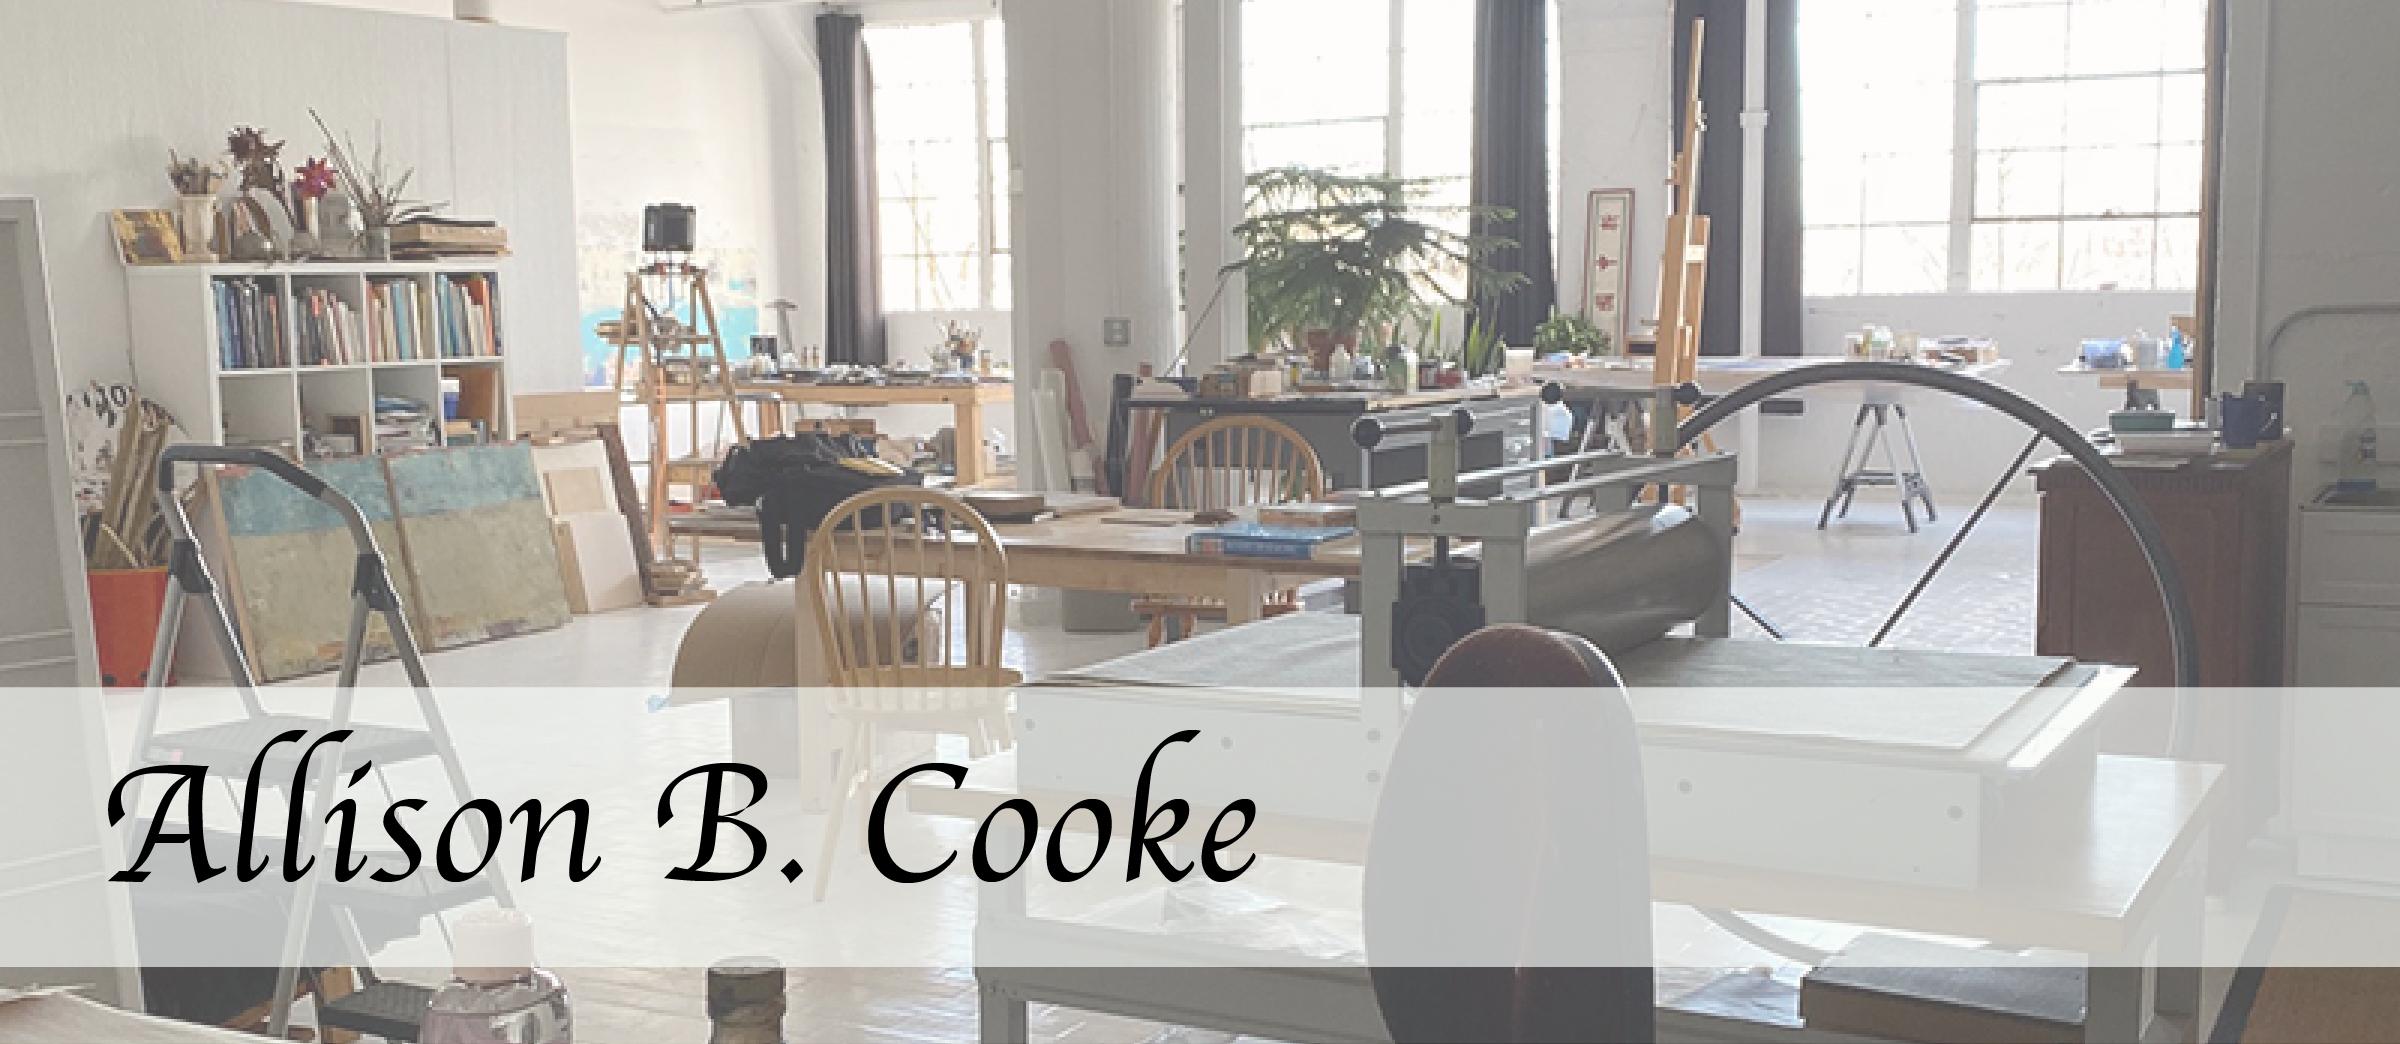 Cooke_Banner